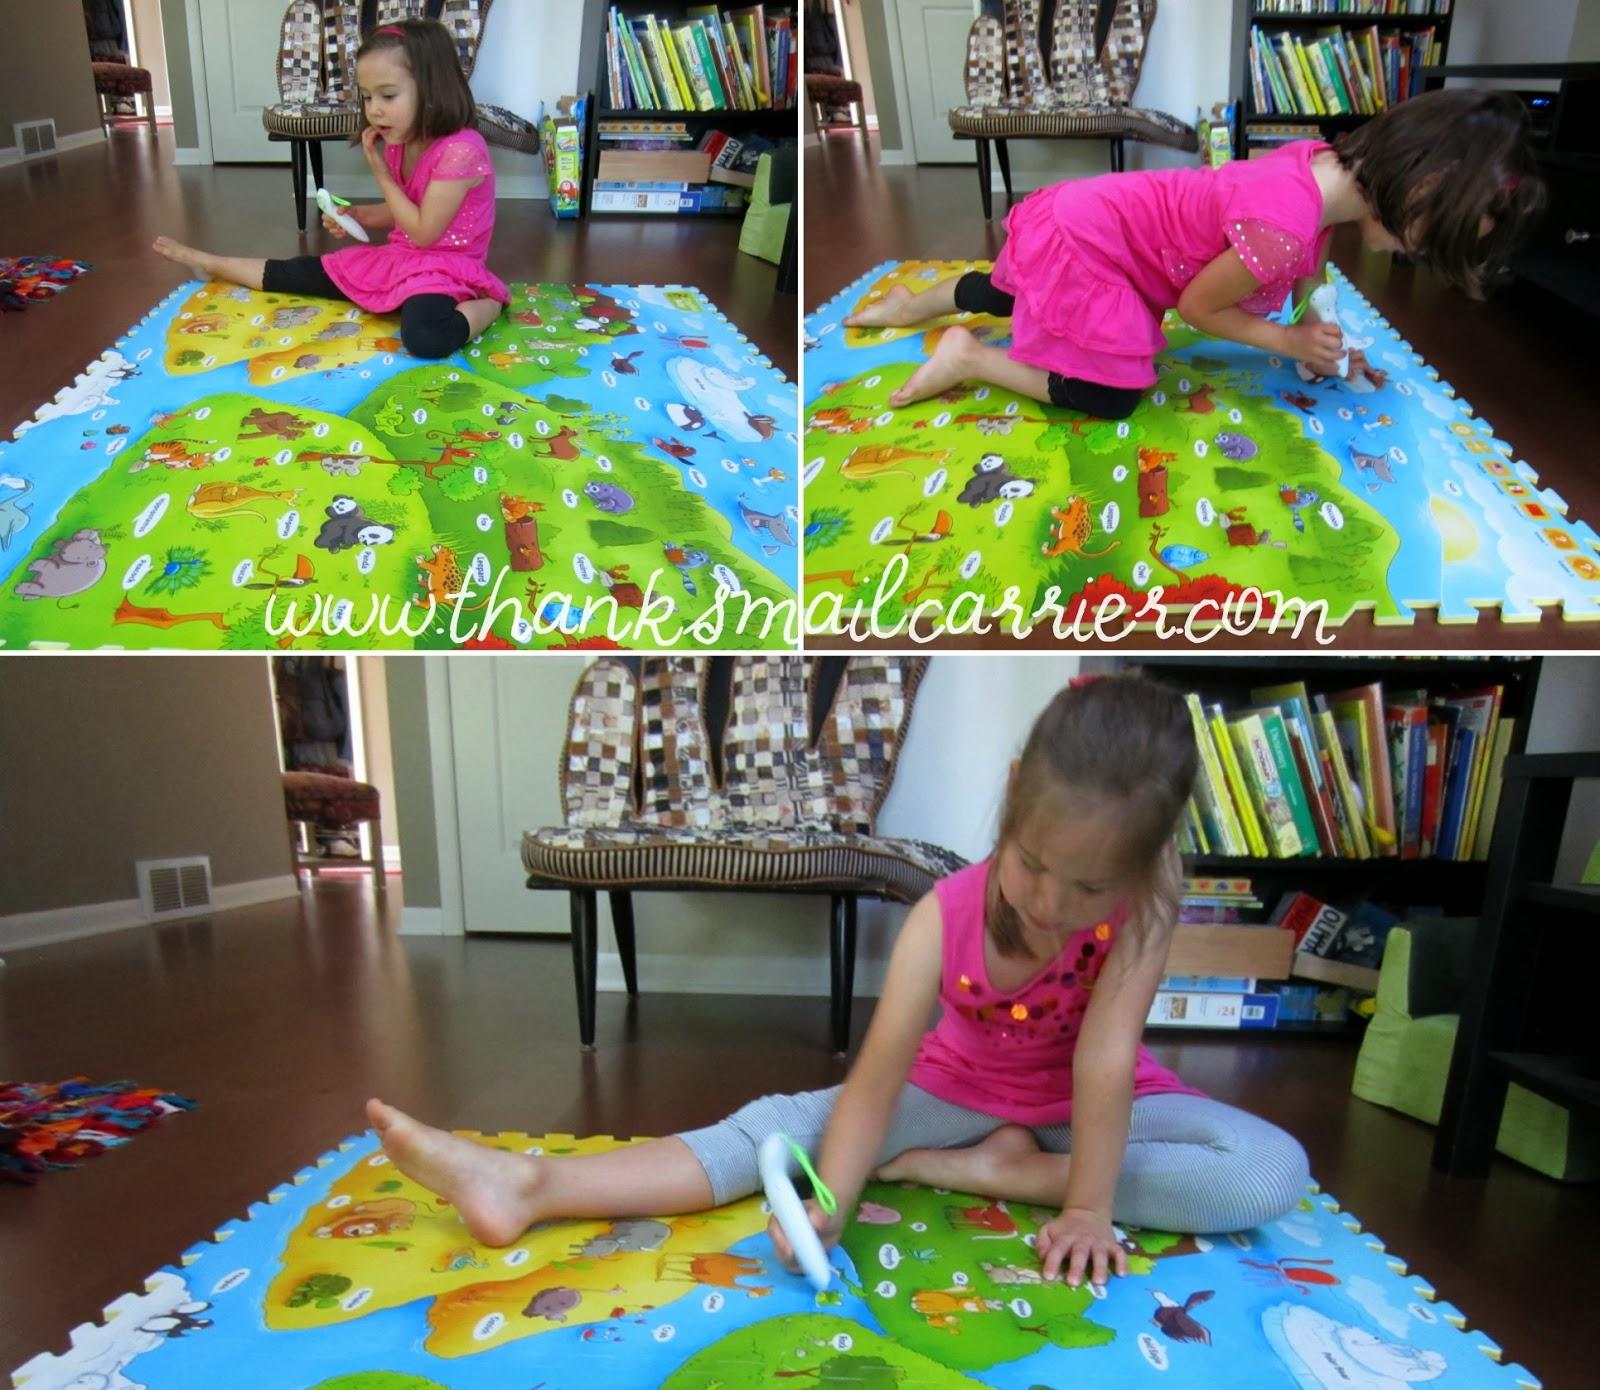 Creative Baby i-Mat kids